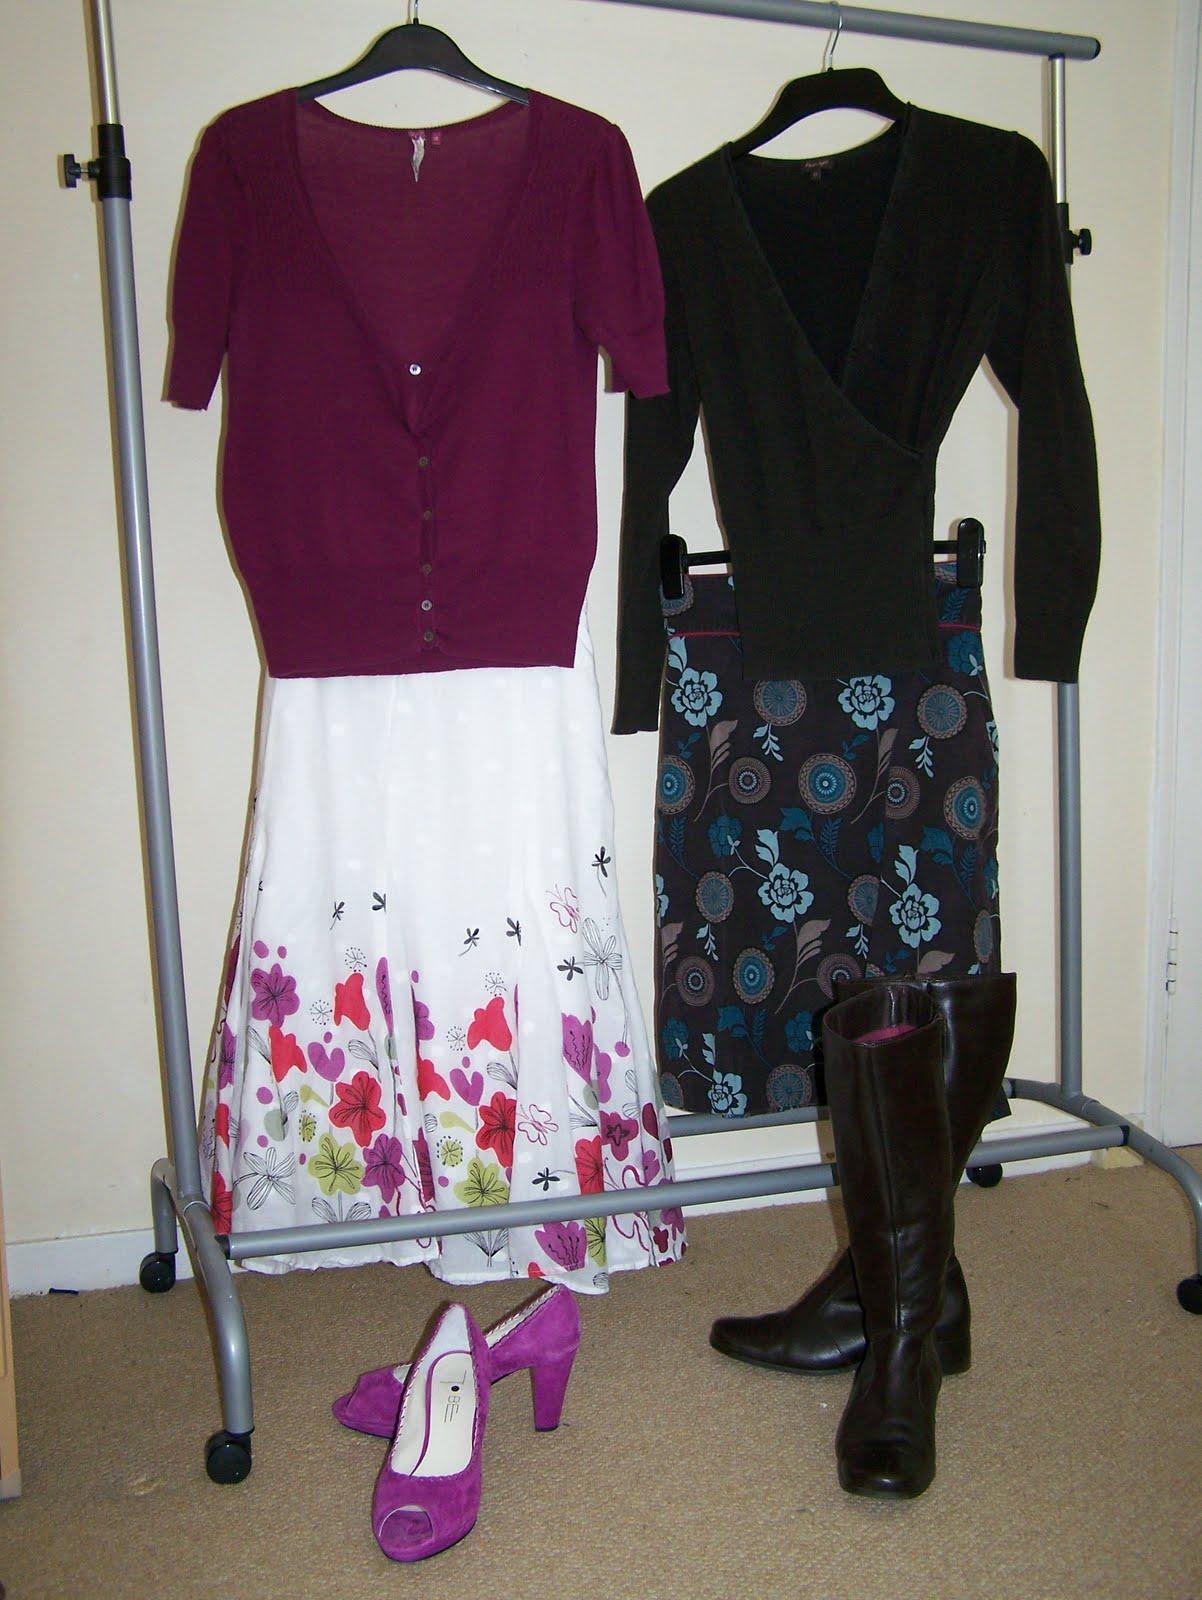 Chic and Minimalist Wardrobe